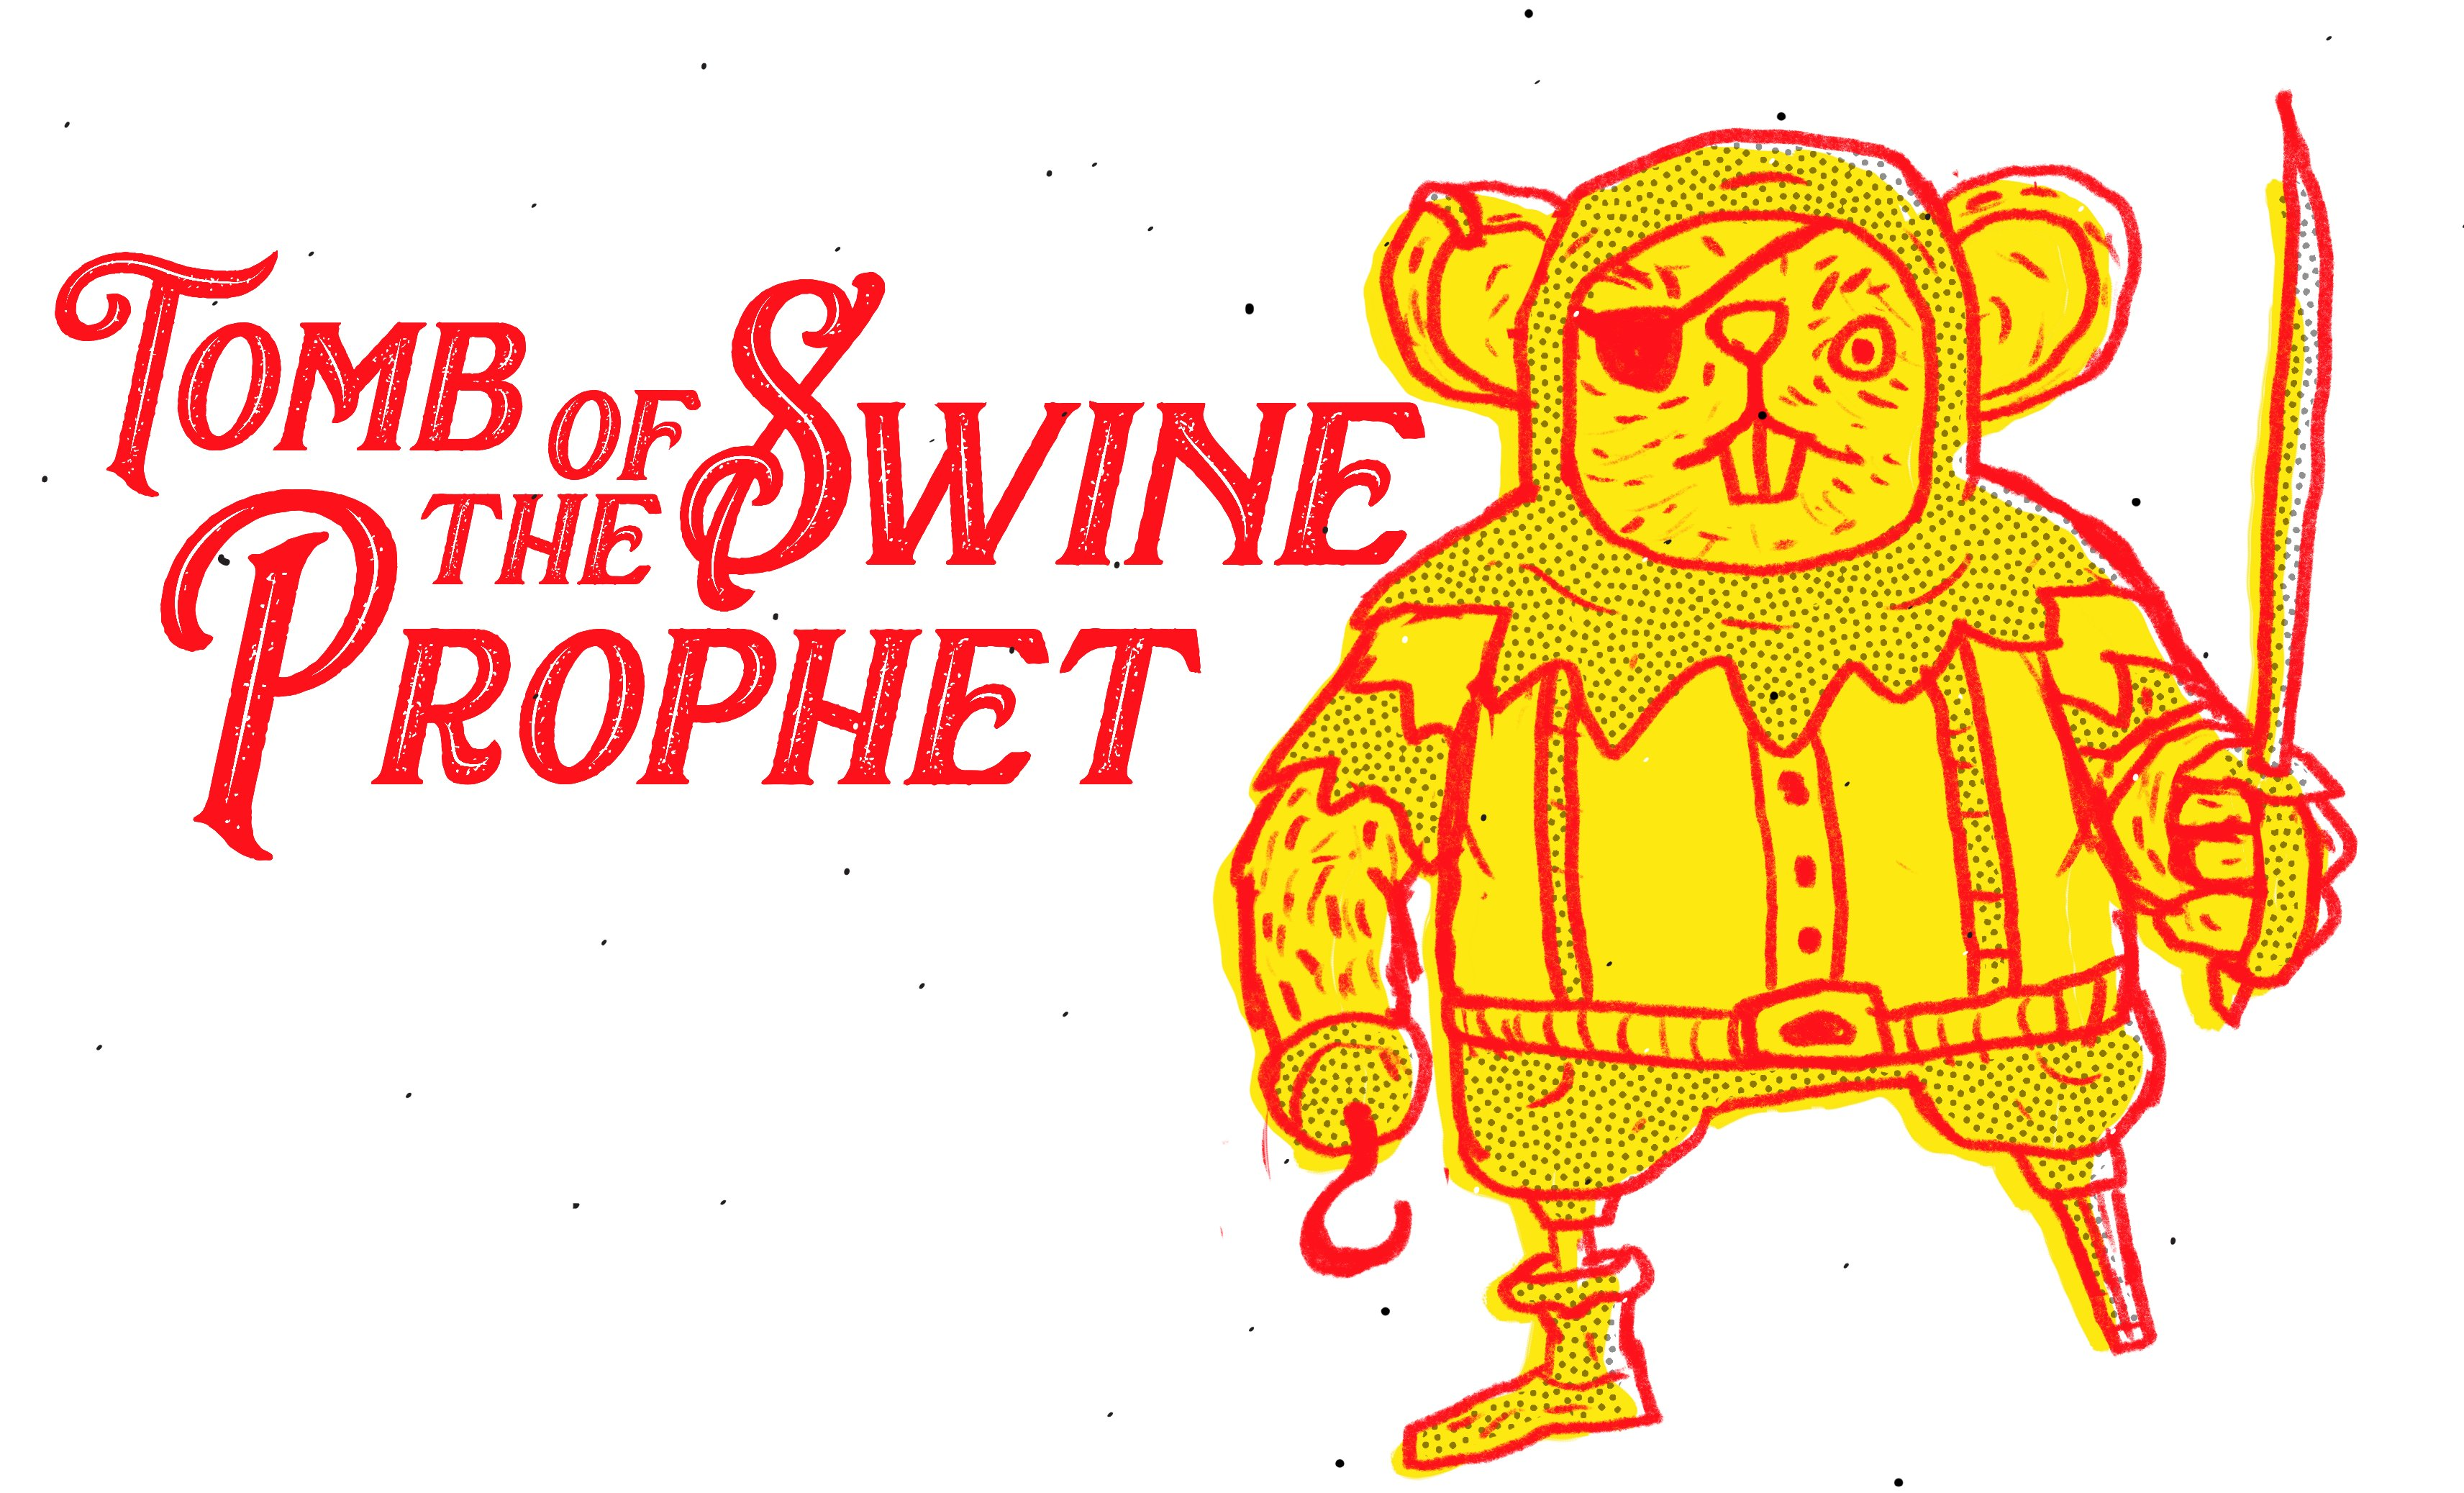 Tomb Of The Swine Prophet